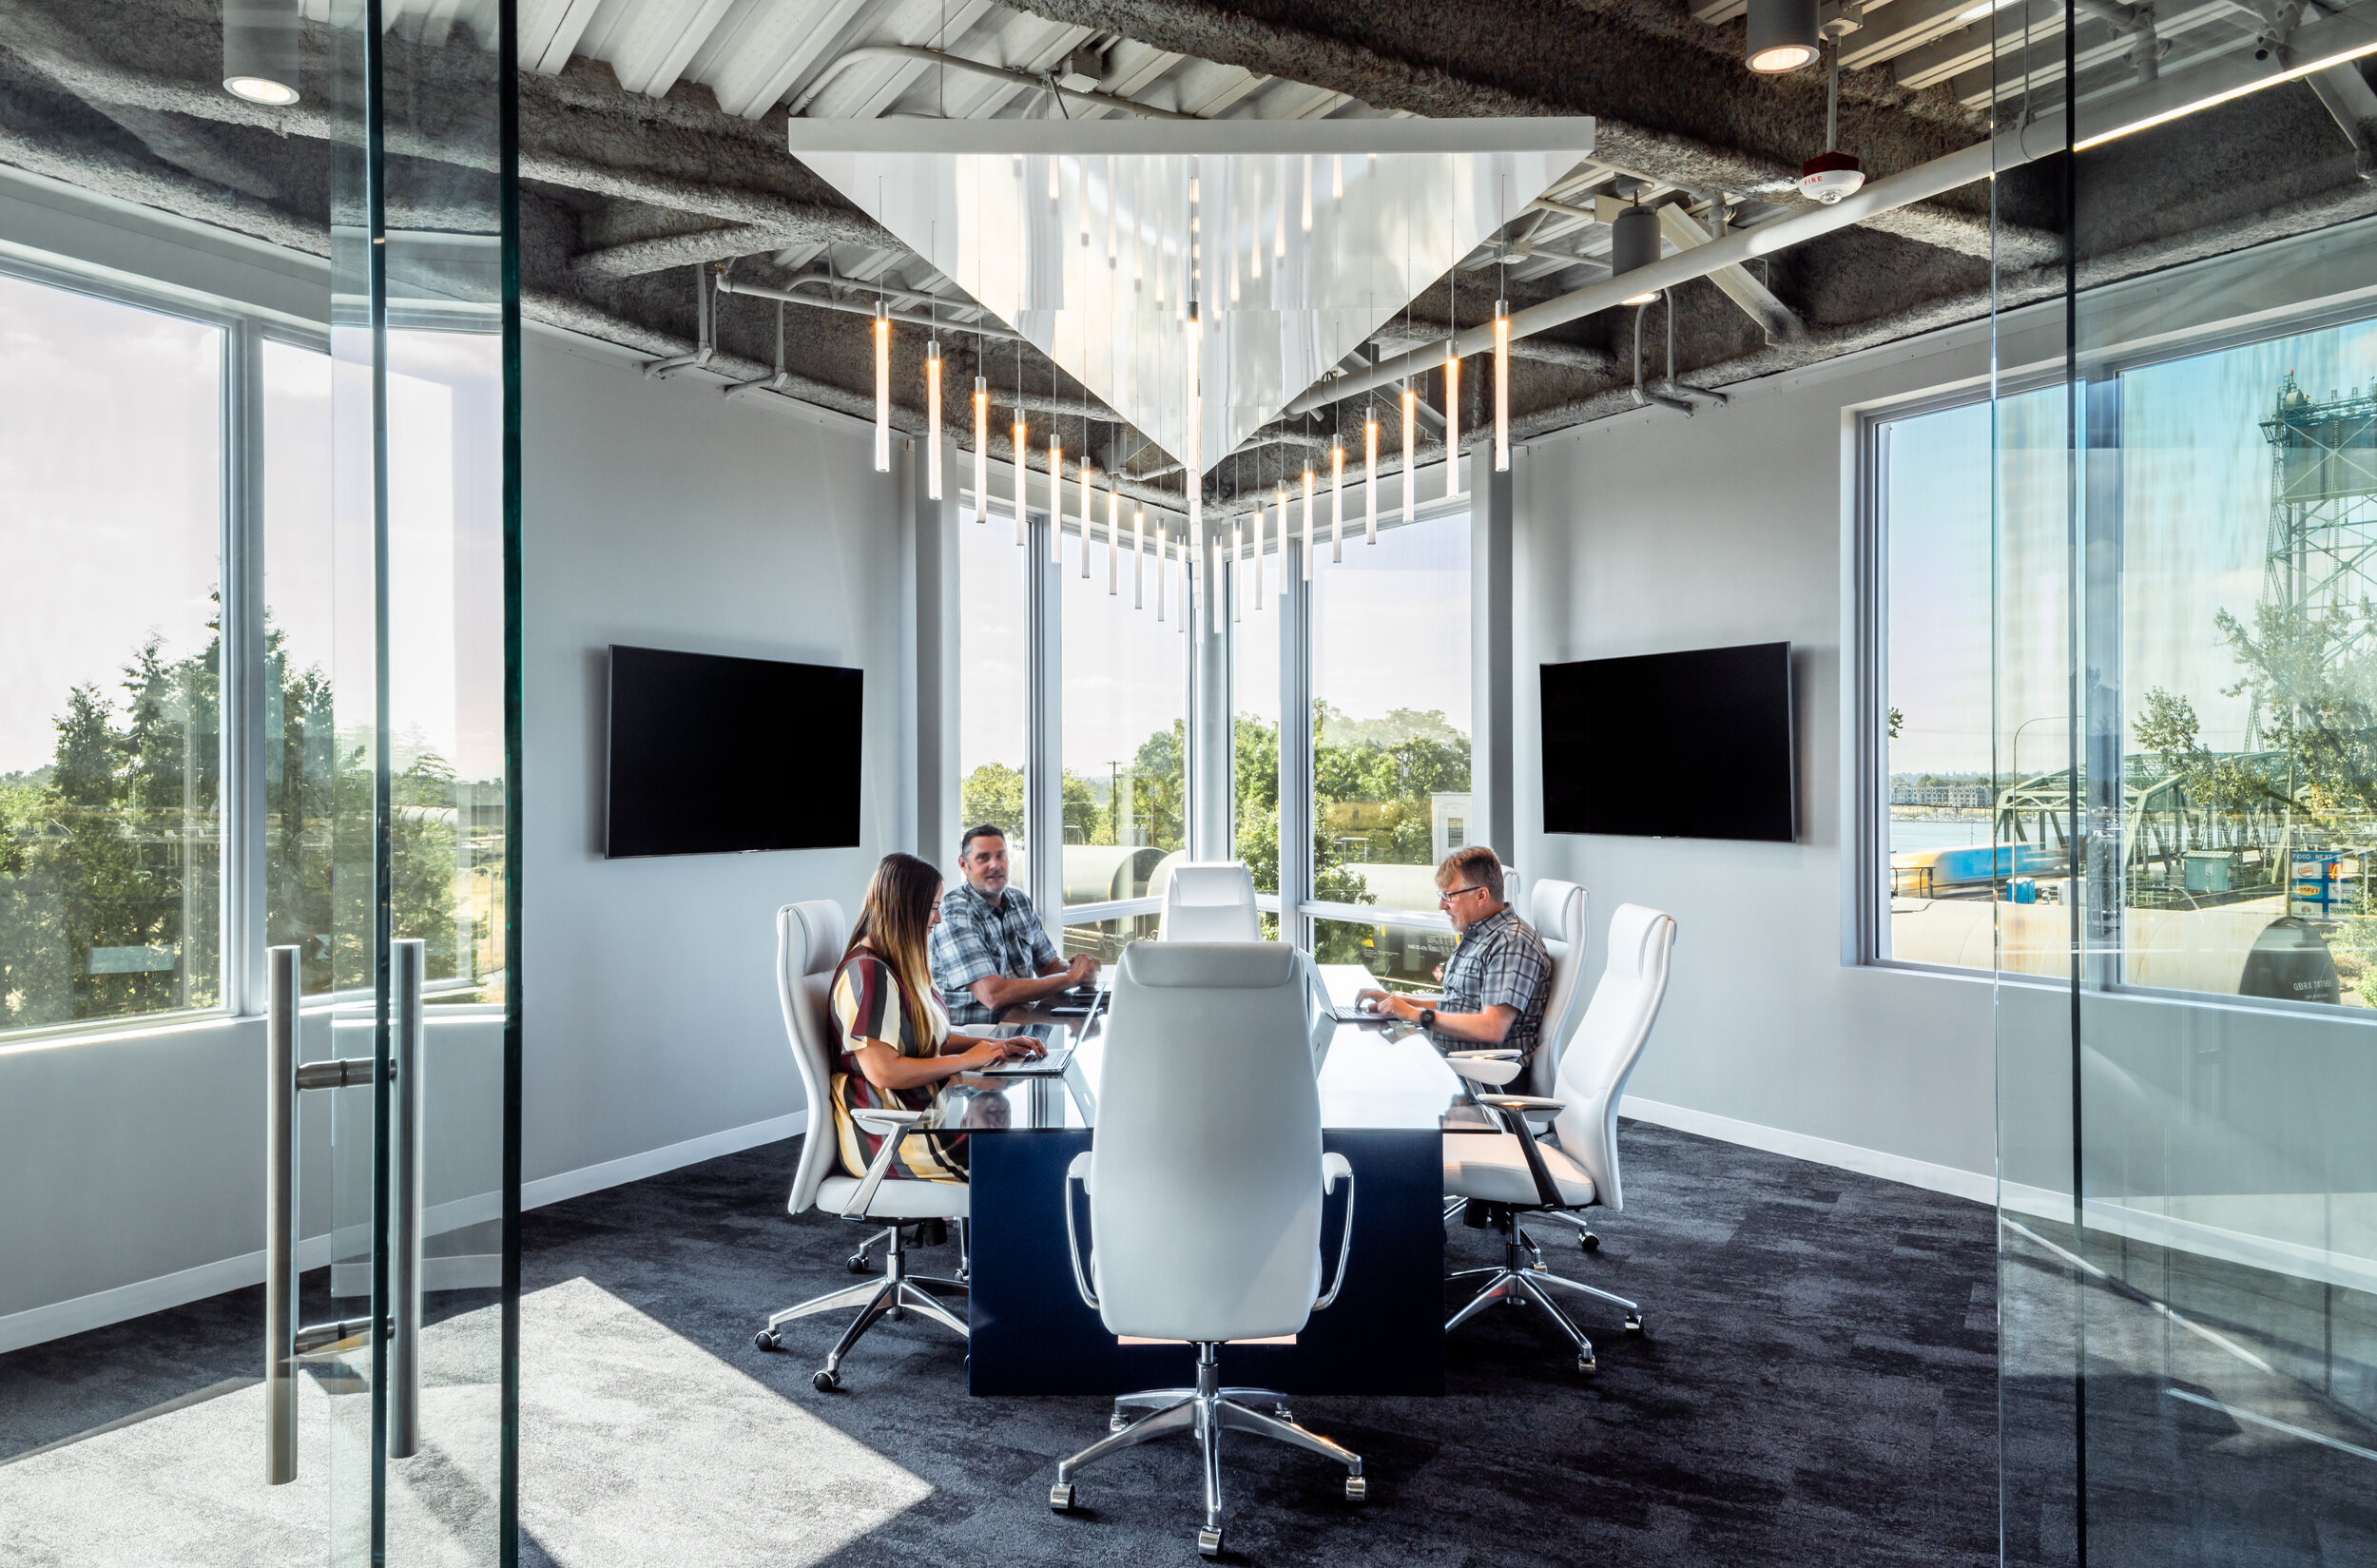 commercial interior design firms vancouver wa